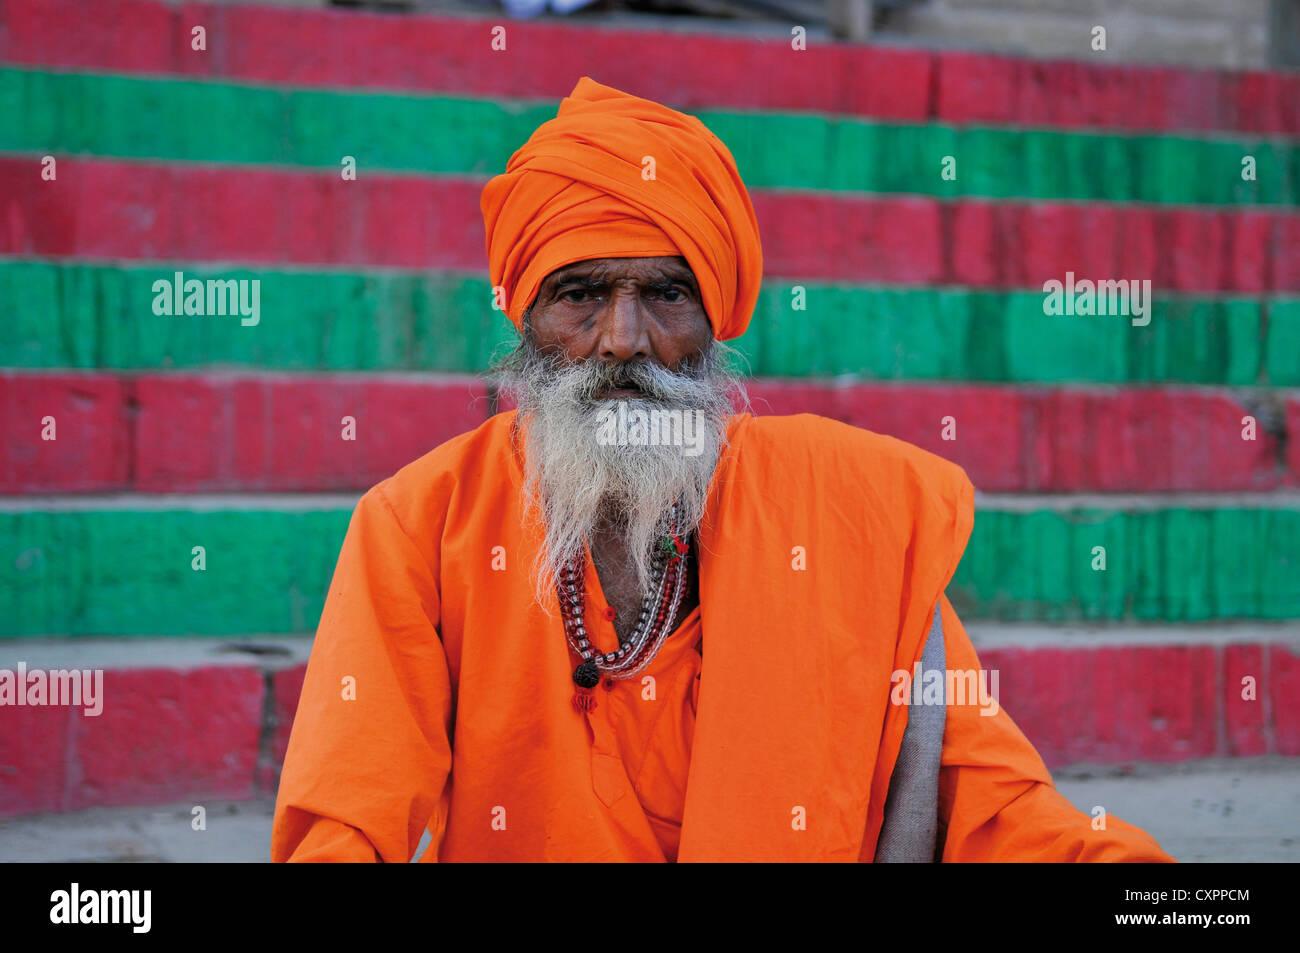 Asia India Uttar Pradesh Varanasi Portrait of a sadhu or ascetic Stock Photo